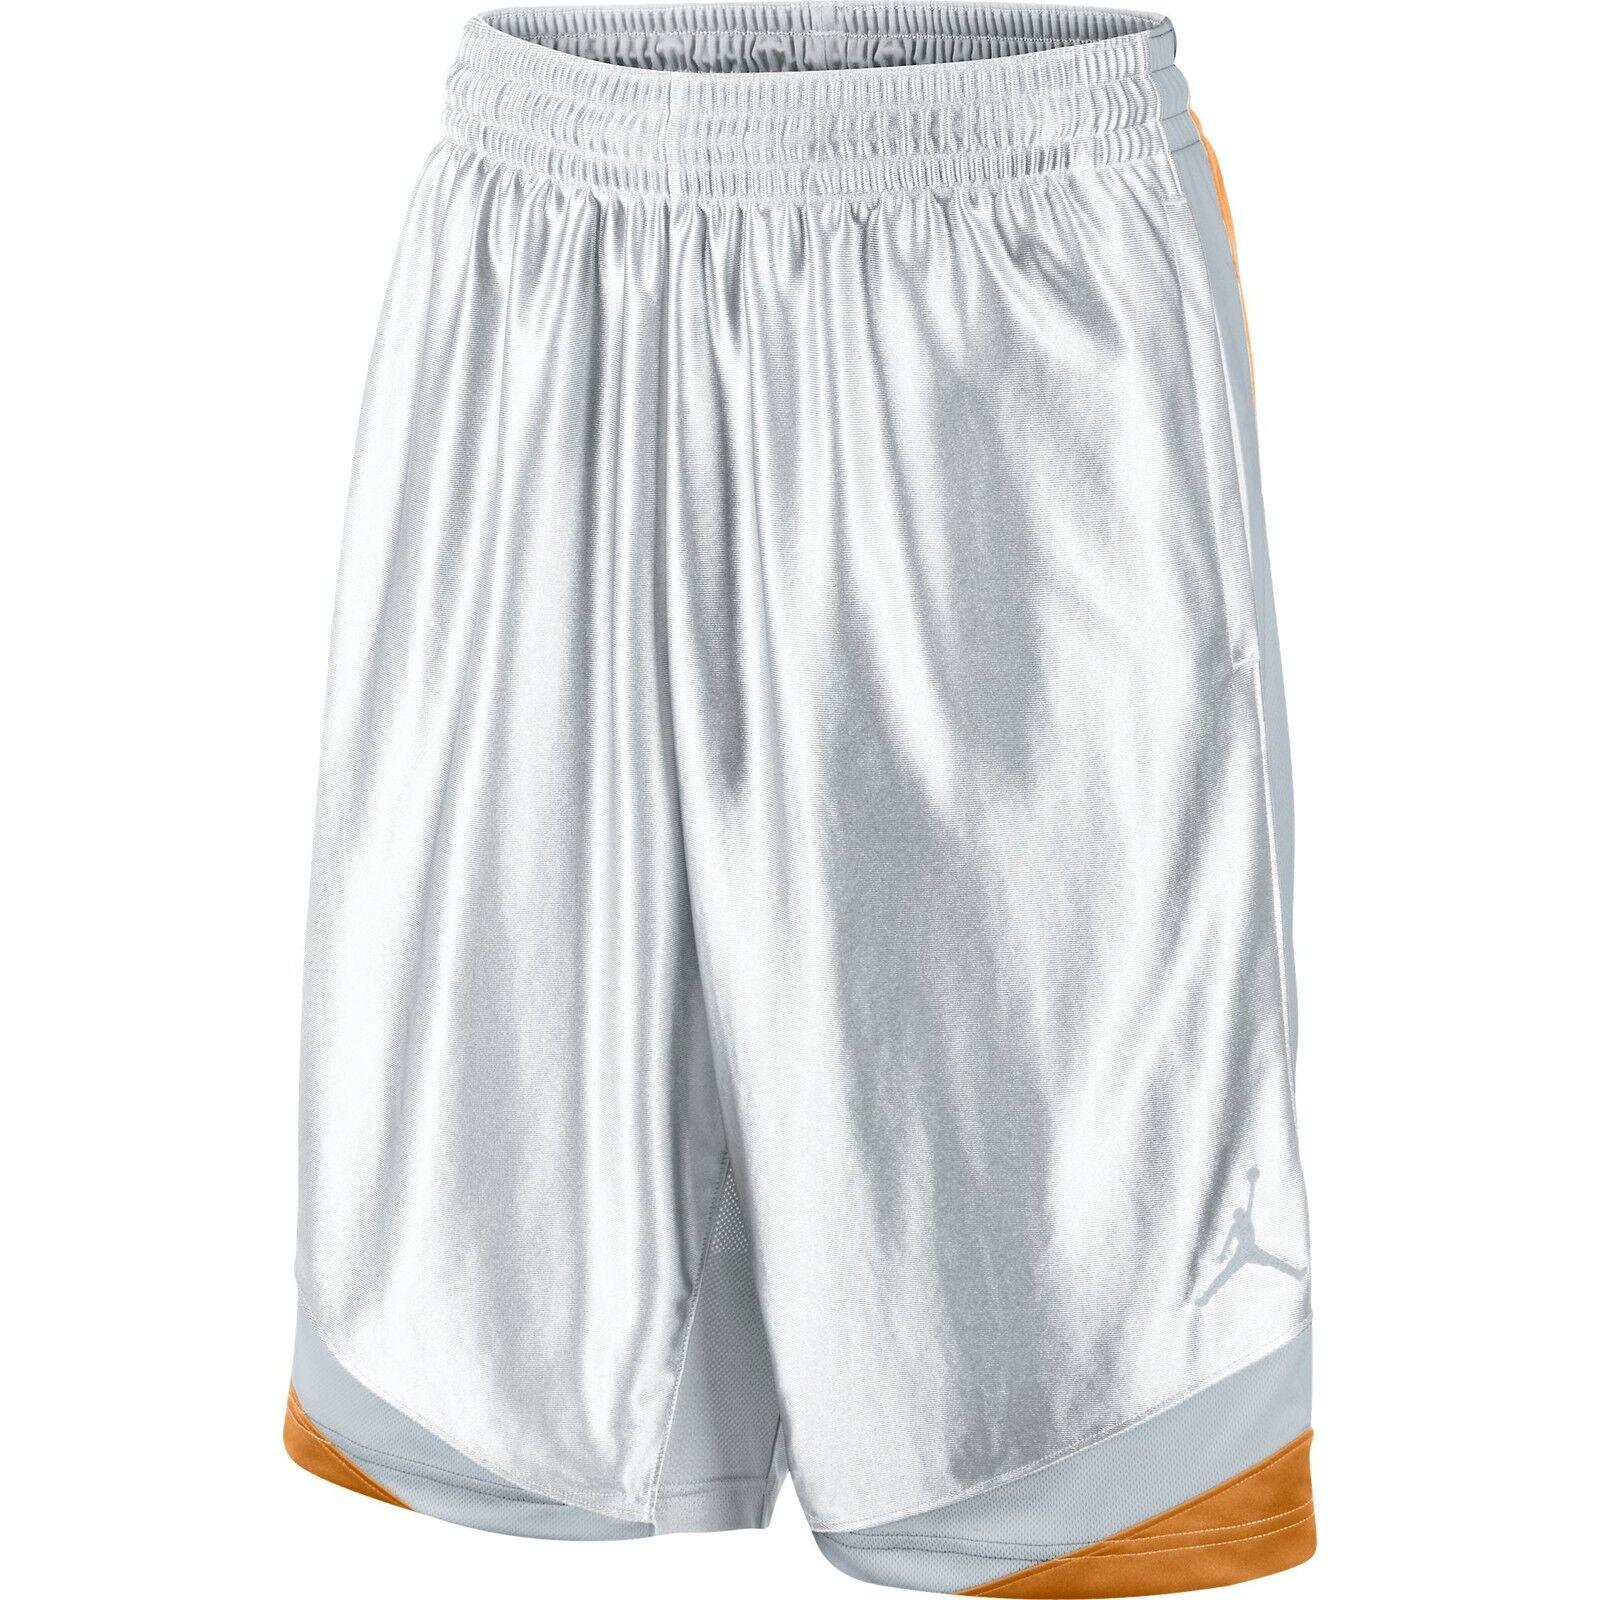 Jordan Court Vision Men's Basketball Shorts White Kumquat Wolf Grey 576638-105